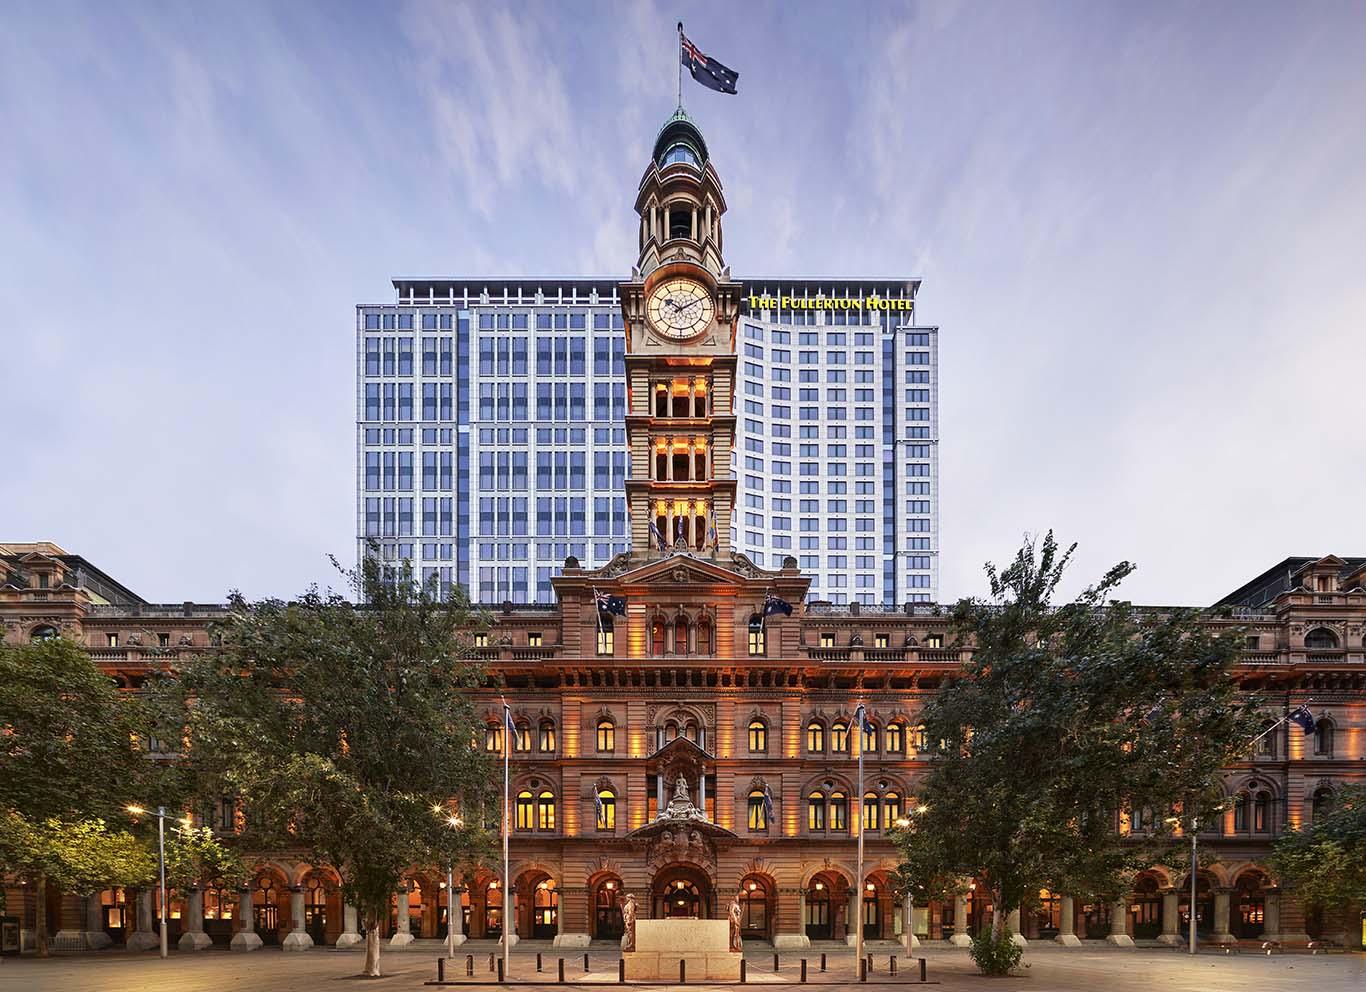 The Fullerton Hotel Sydney (Fullerton Hotels & Resorts photo)